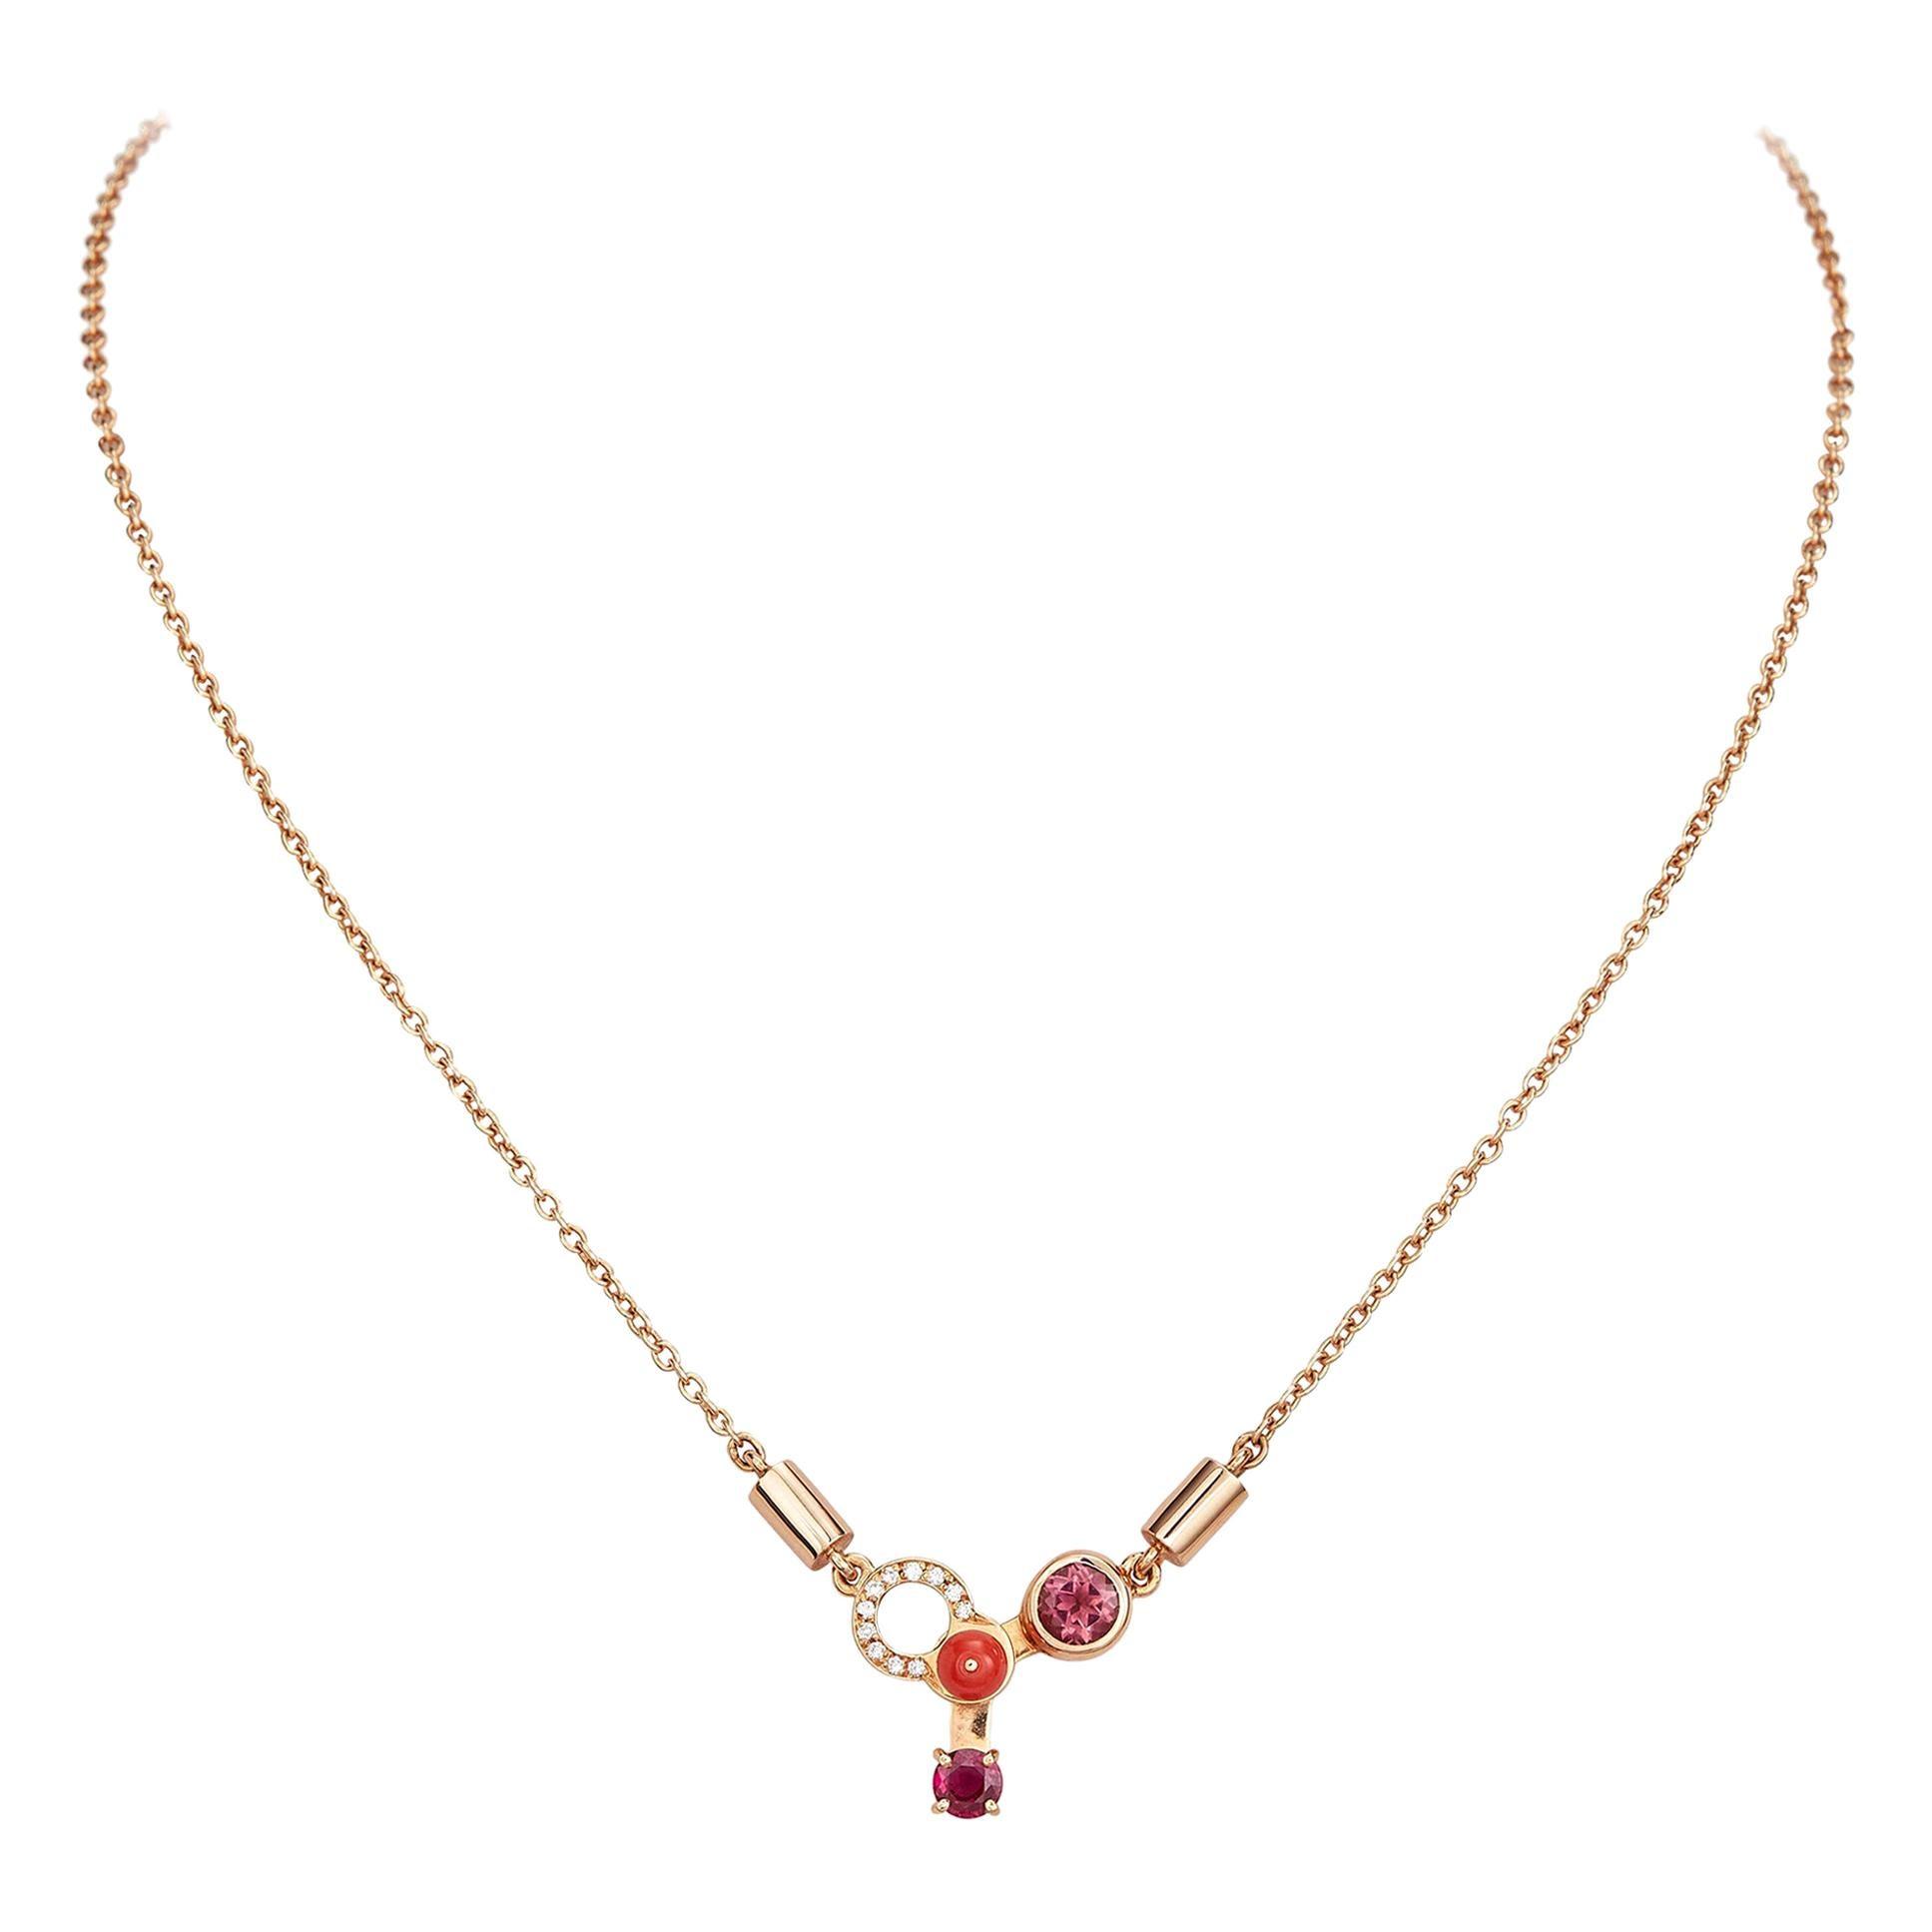 Nathalie Jean 0.06 Carat Diamond Ruby Tourmaline Carnelian Gold Pendant Necklace